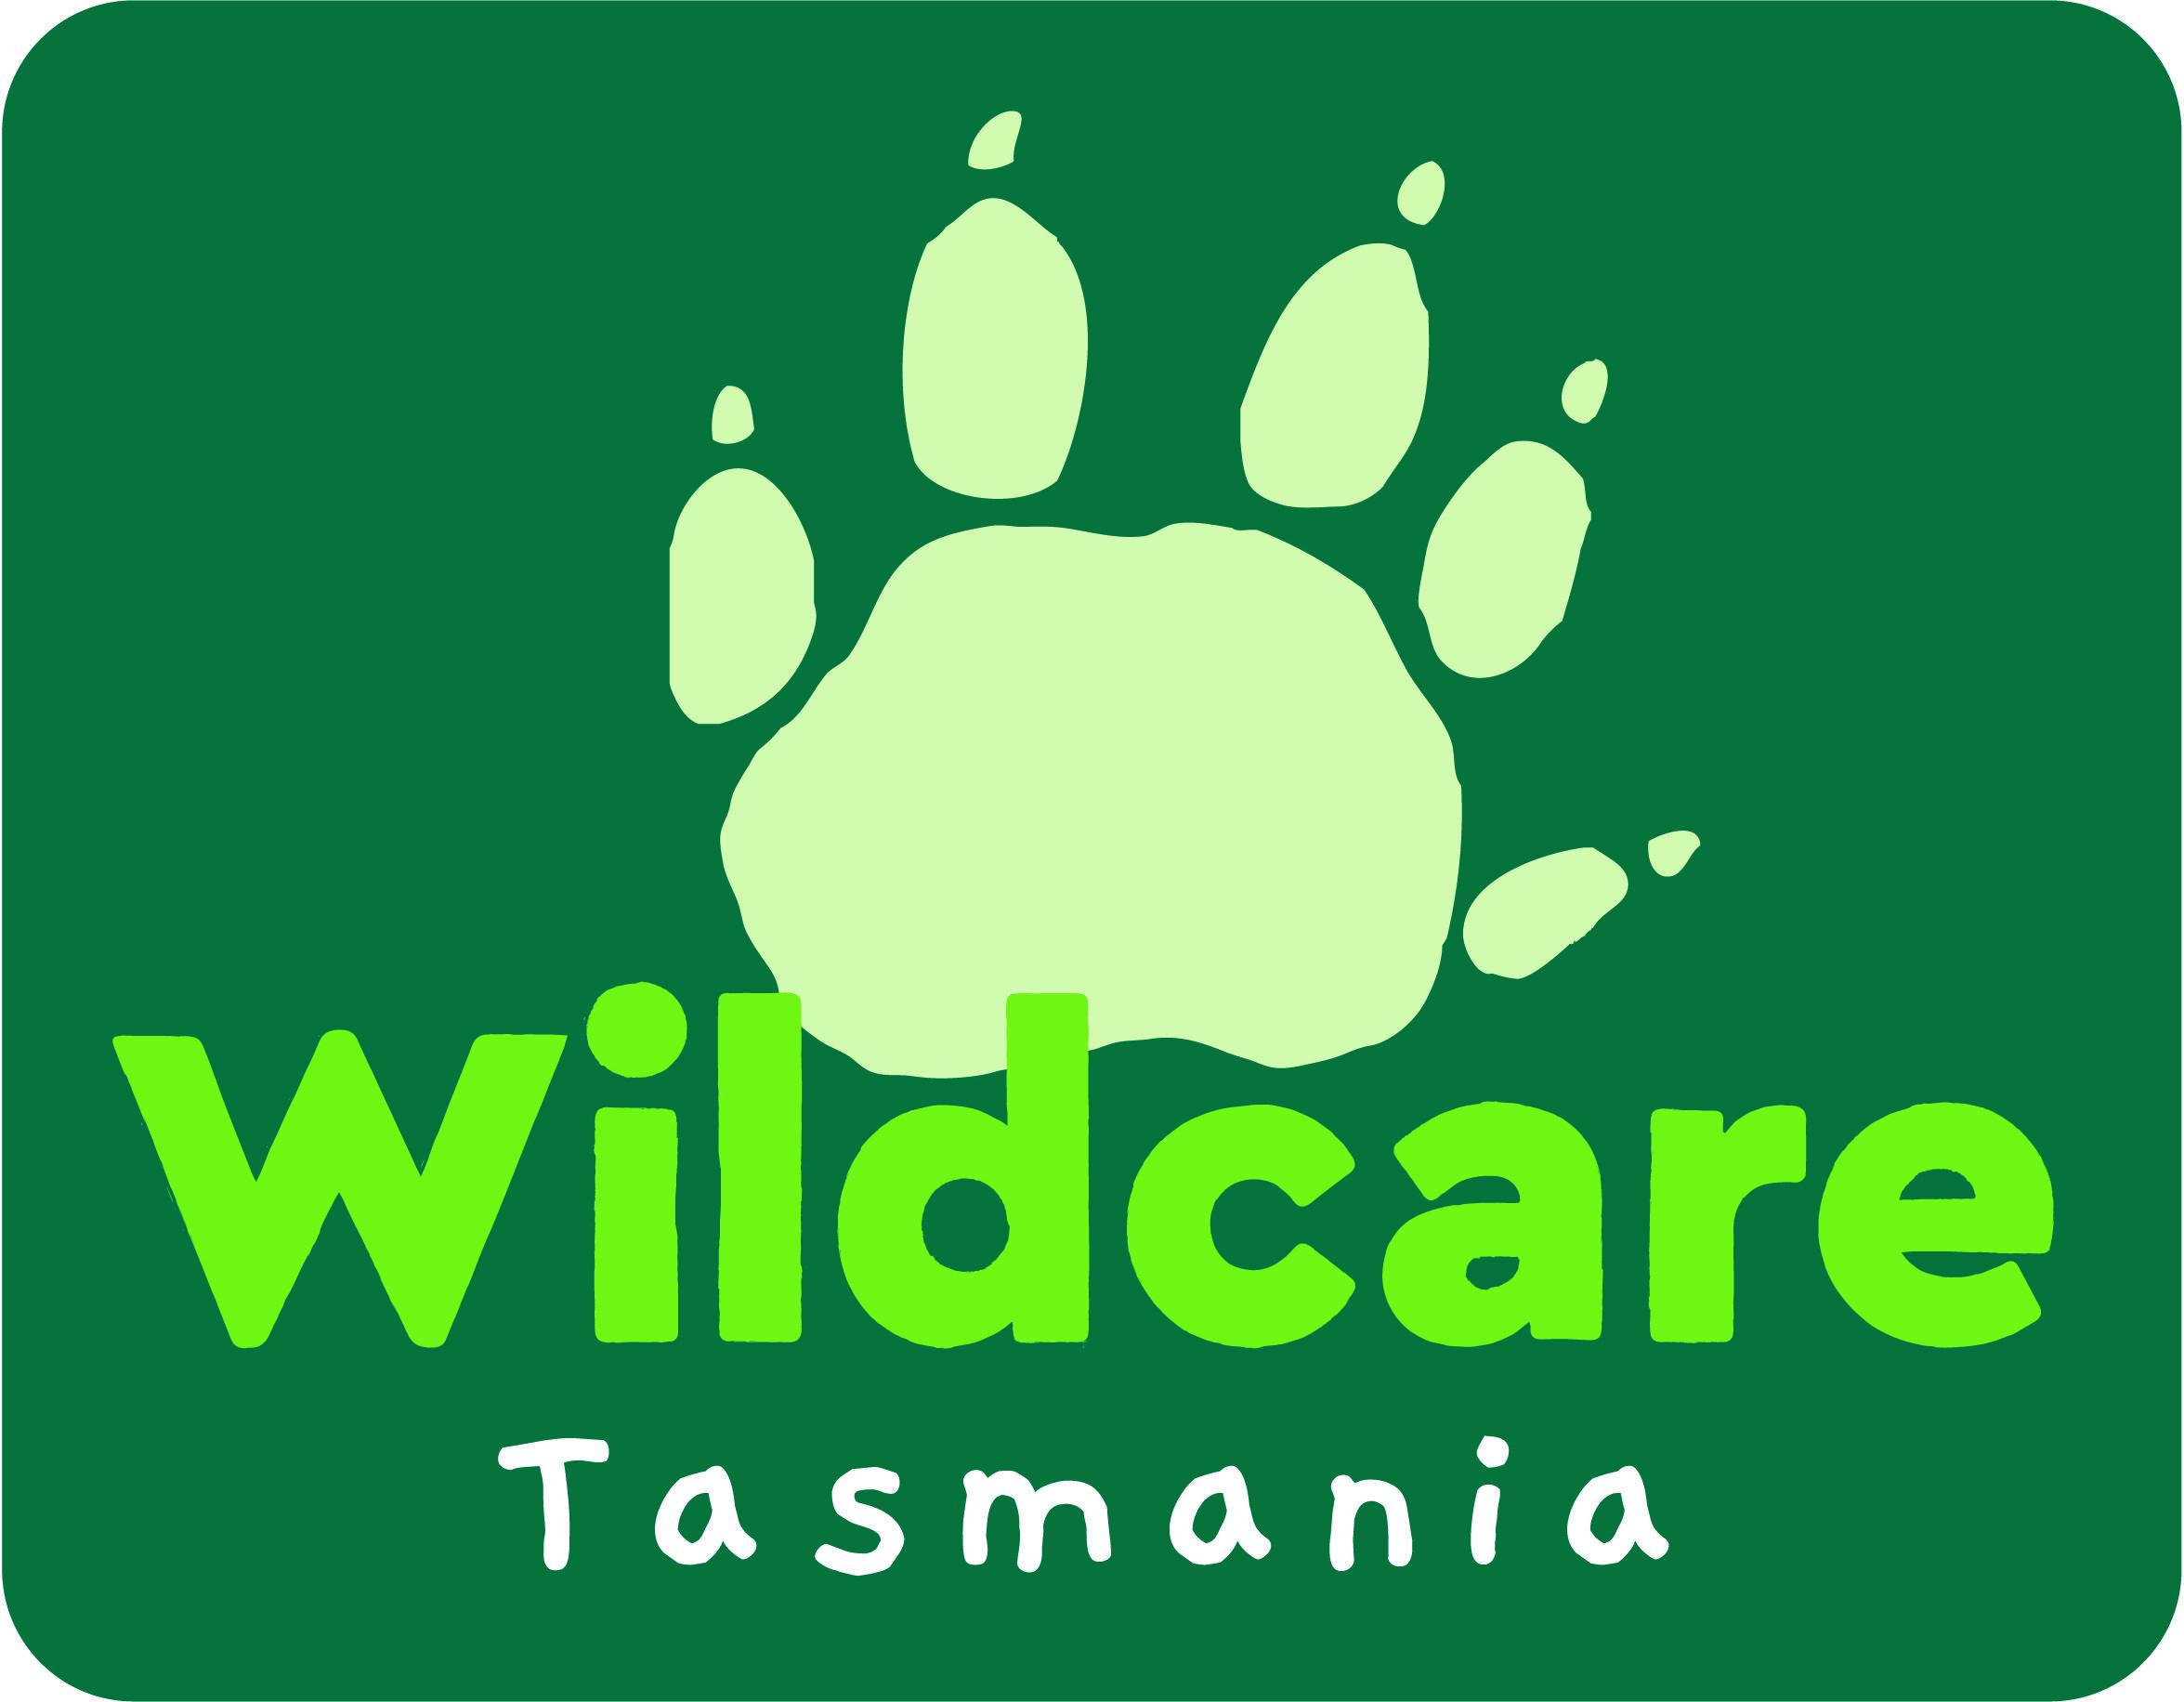 Wildcare-Logo-Dark green-Vertical-cmyk.jpg